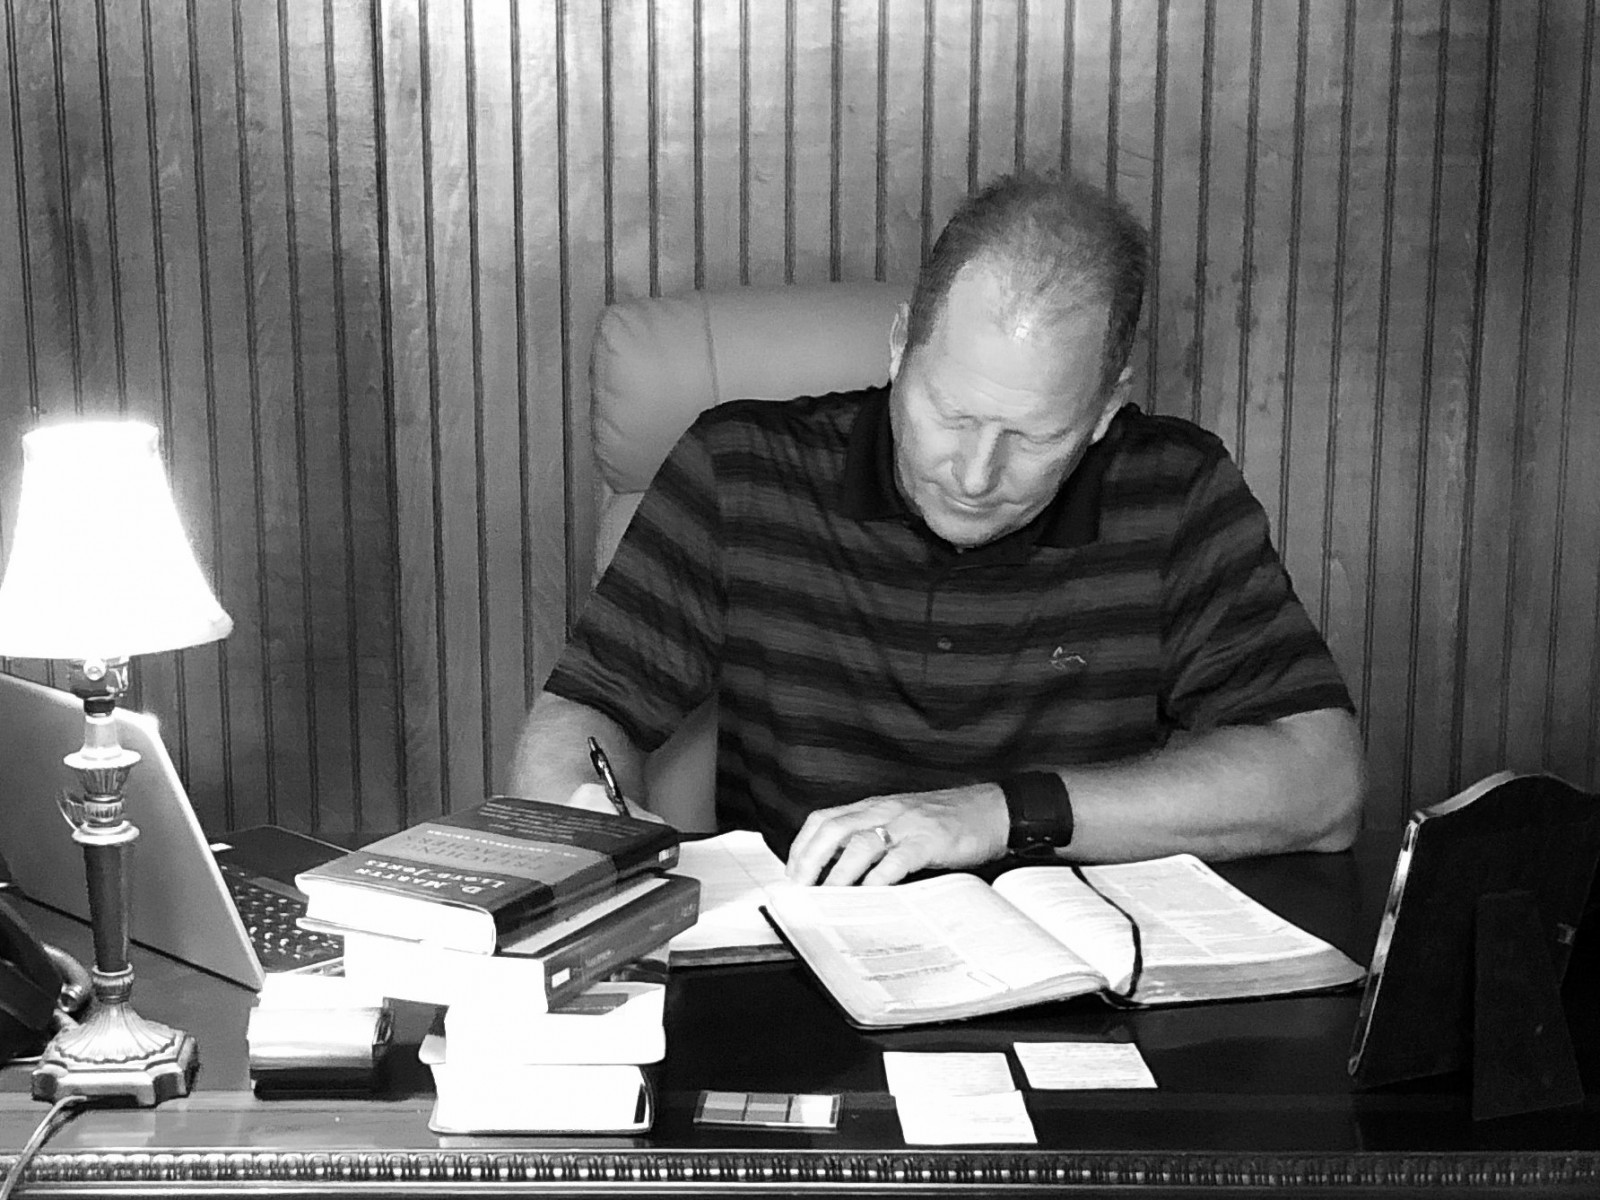 Pastor Kelly study